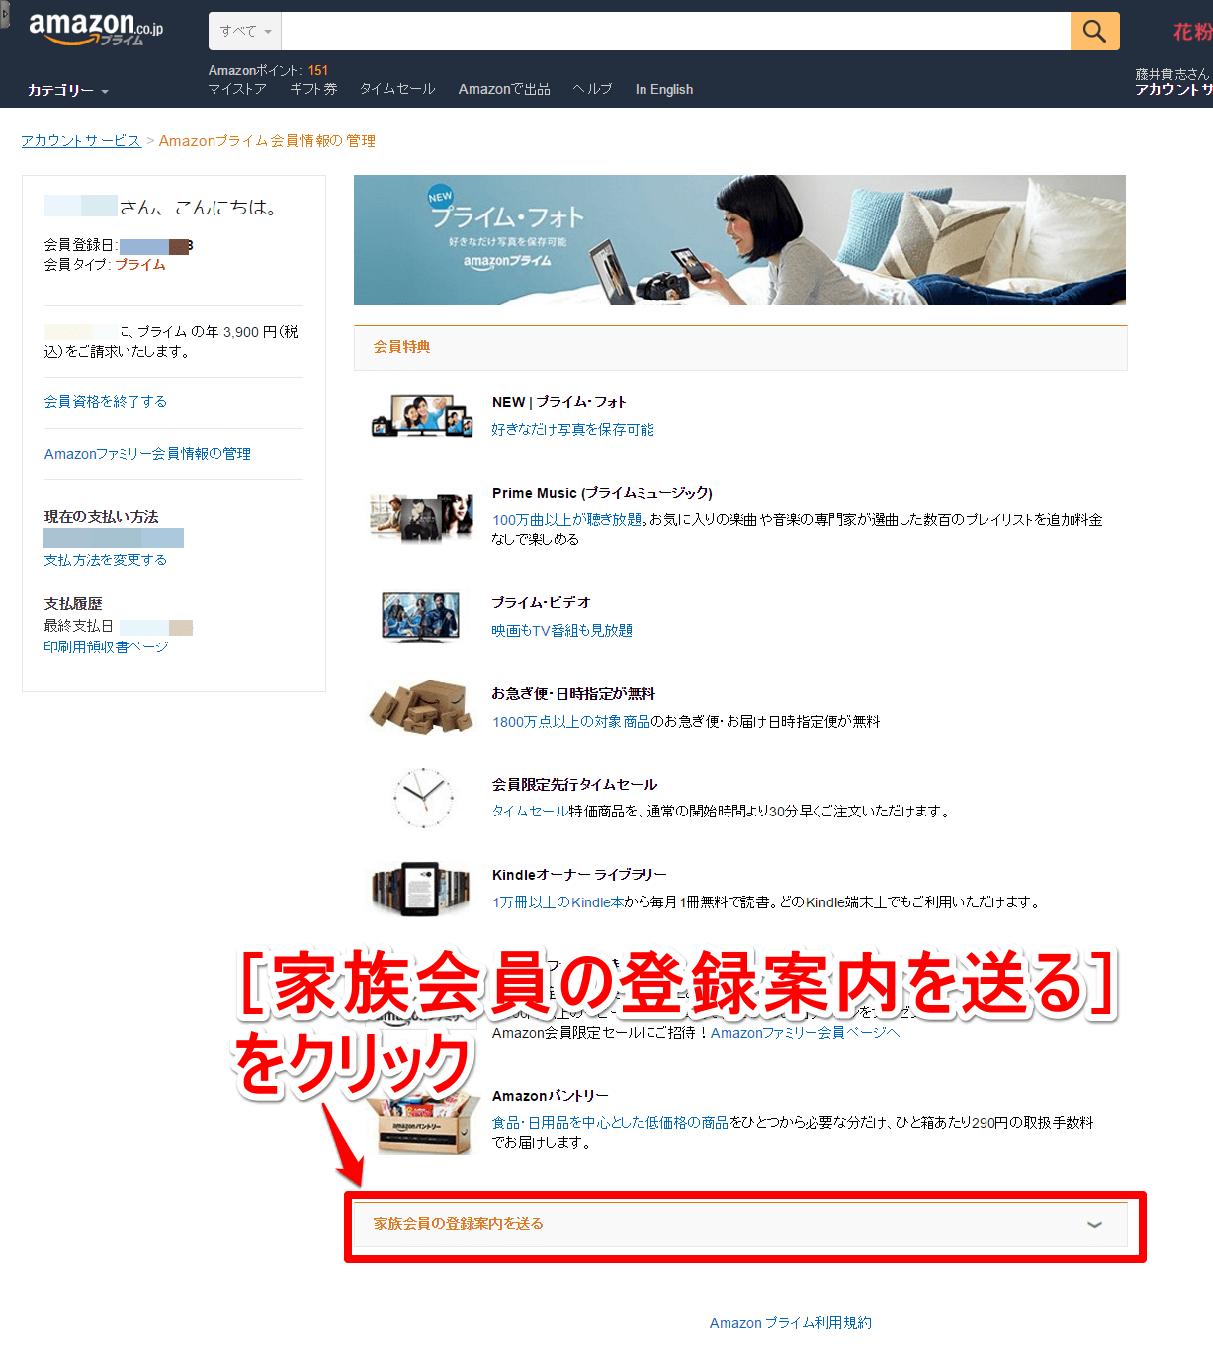 [Amazonプライム家族会員の管理]ページにアクセスする